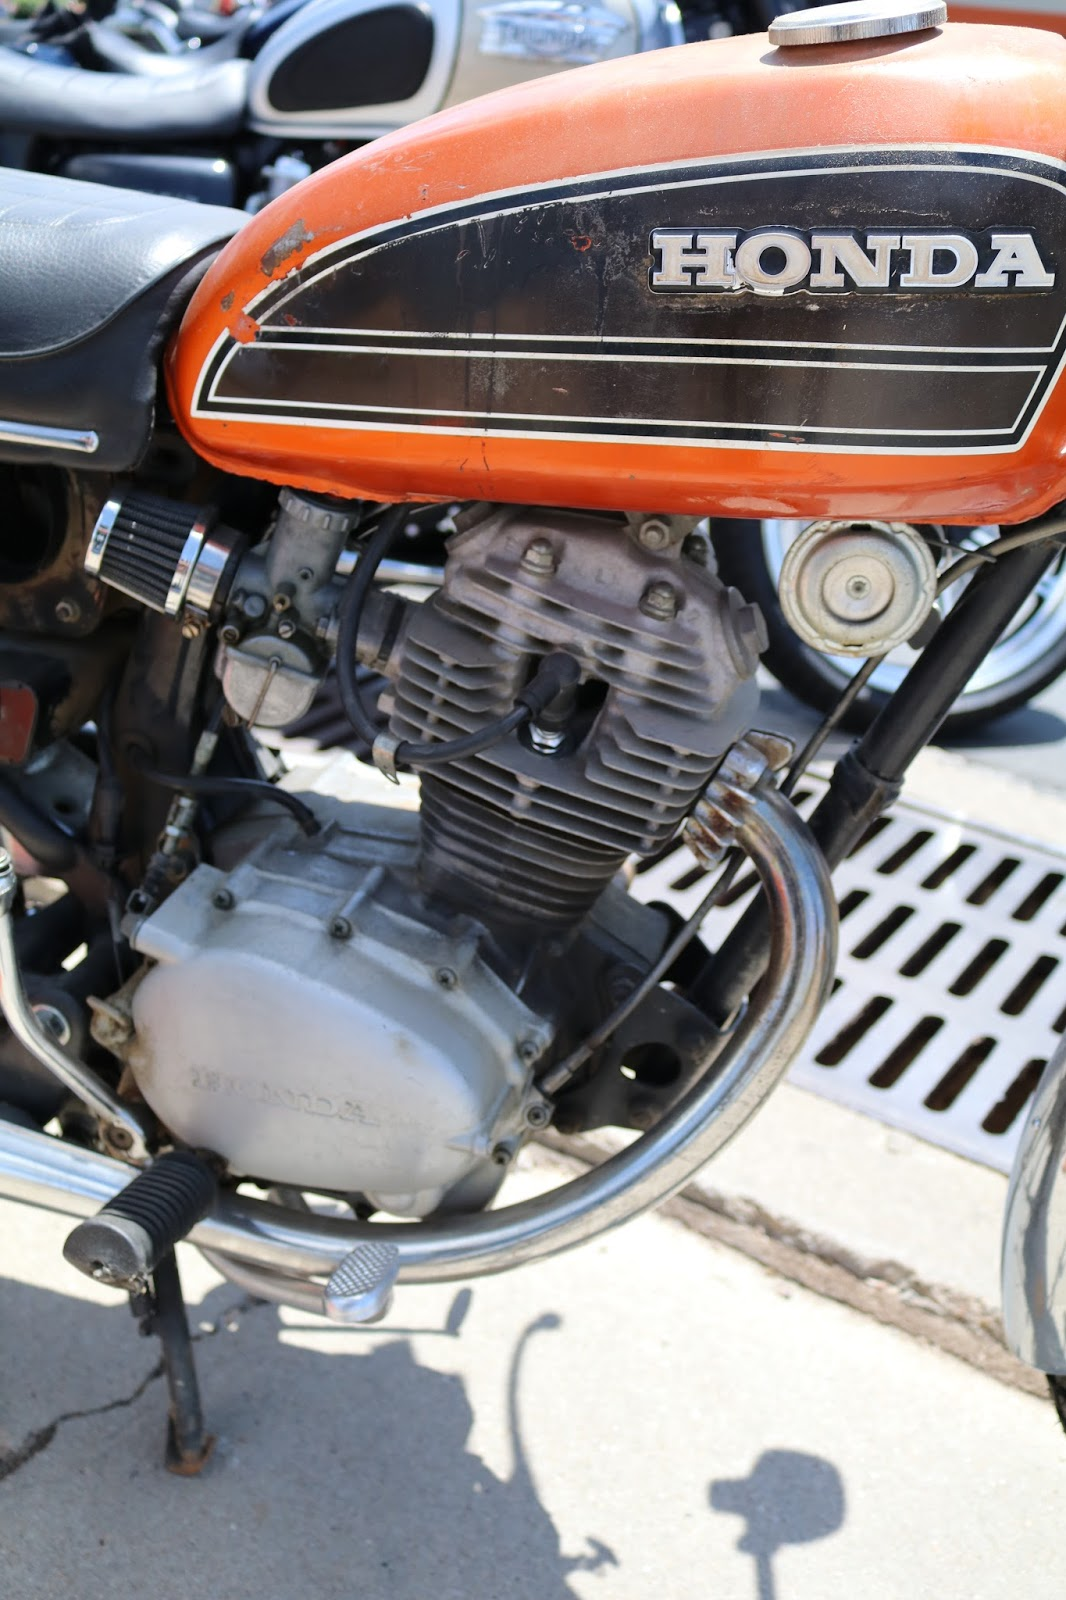 Oldmotodude Honda Cb125 At The Vintage Motorcycle Show